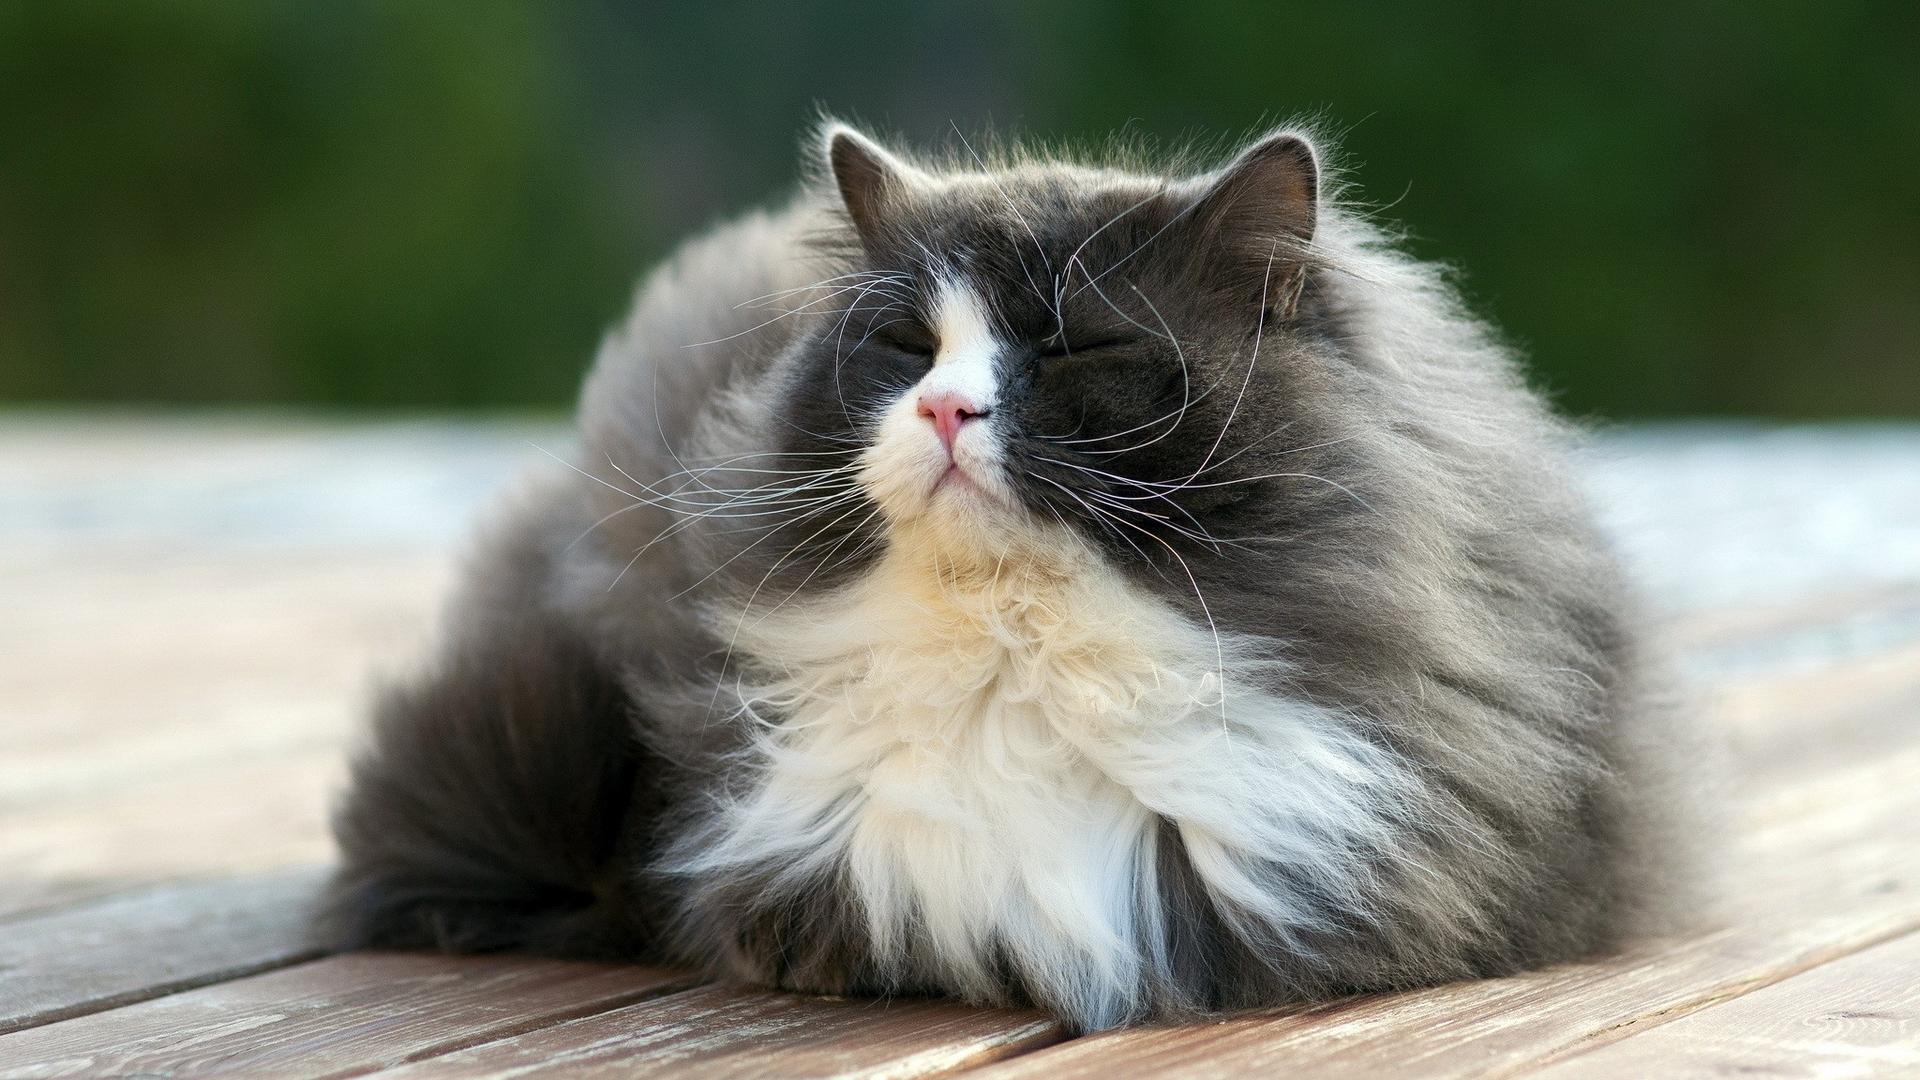 Fat Fluffy Cat Small Eyes